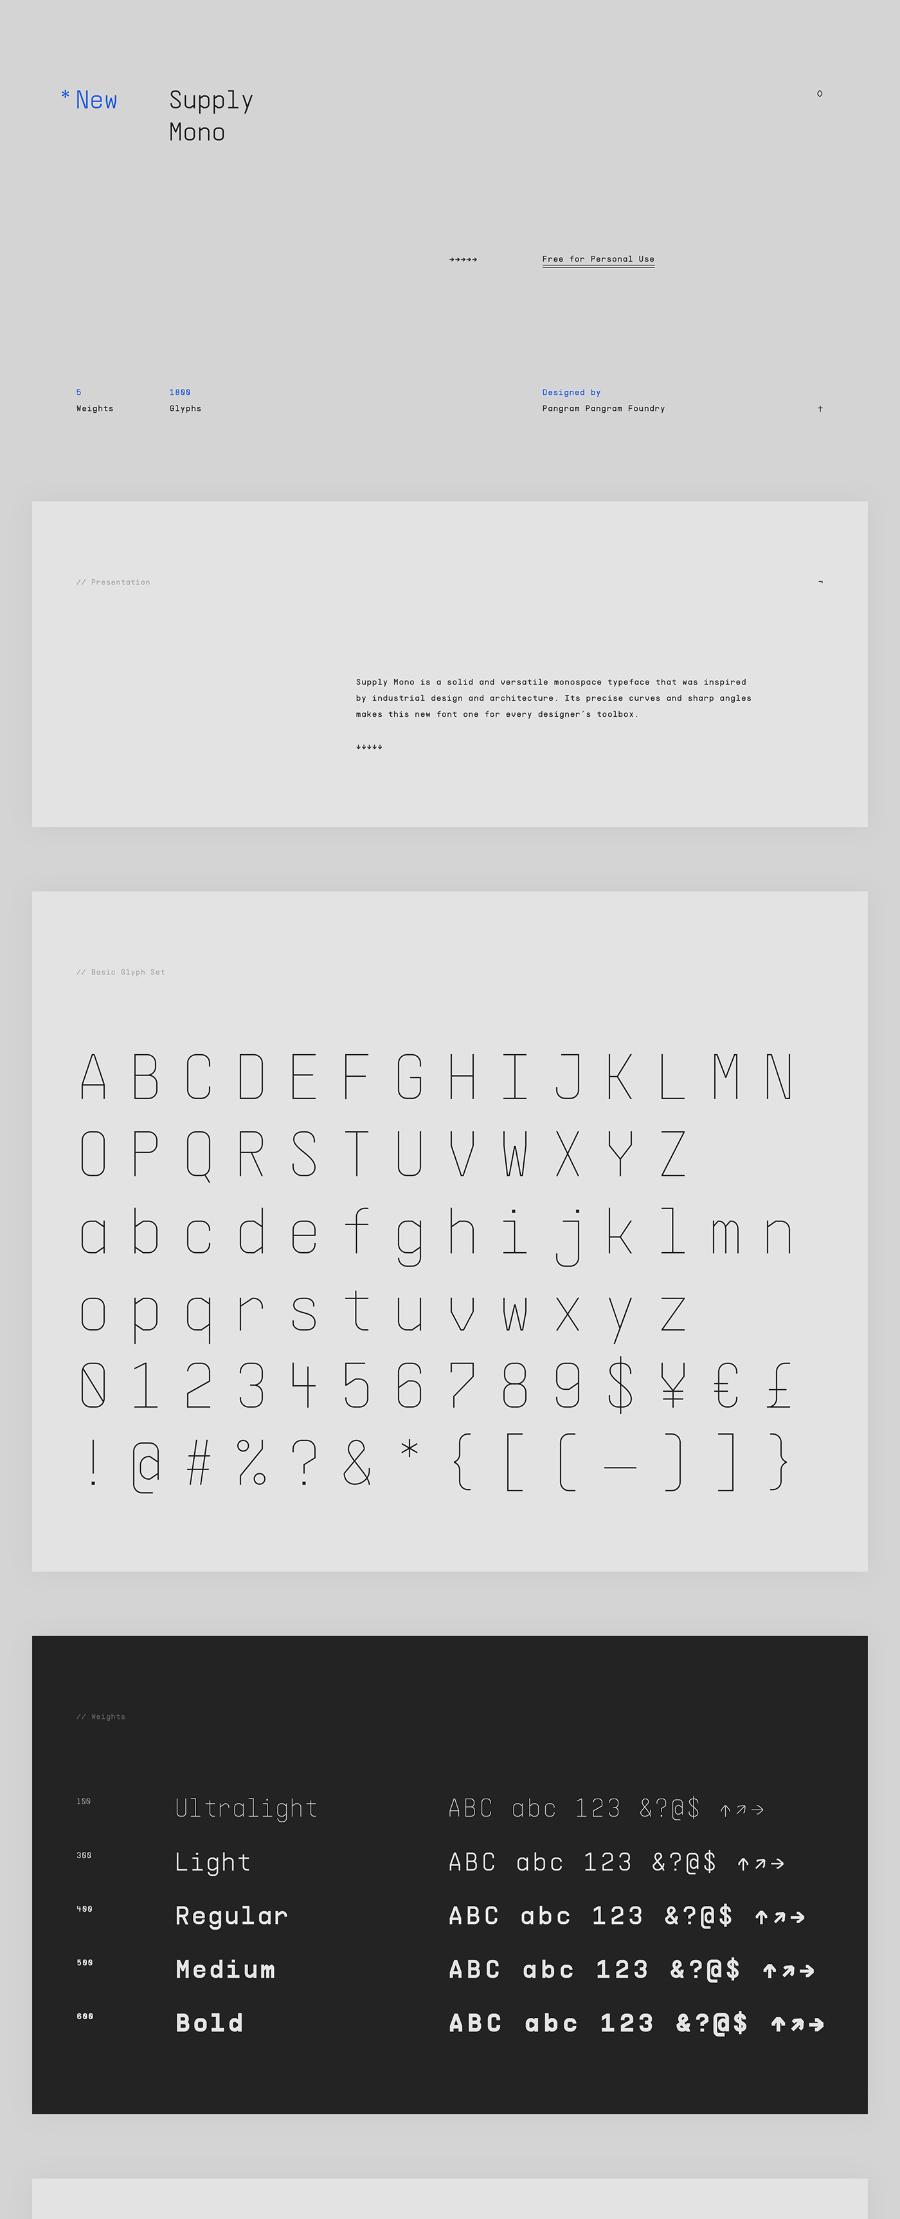 Supply Mono Font Family - Free Fonts